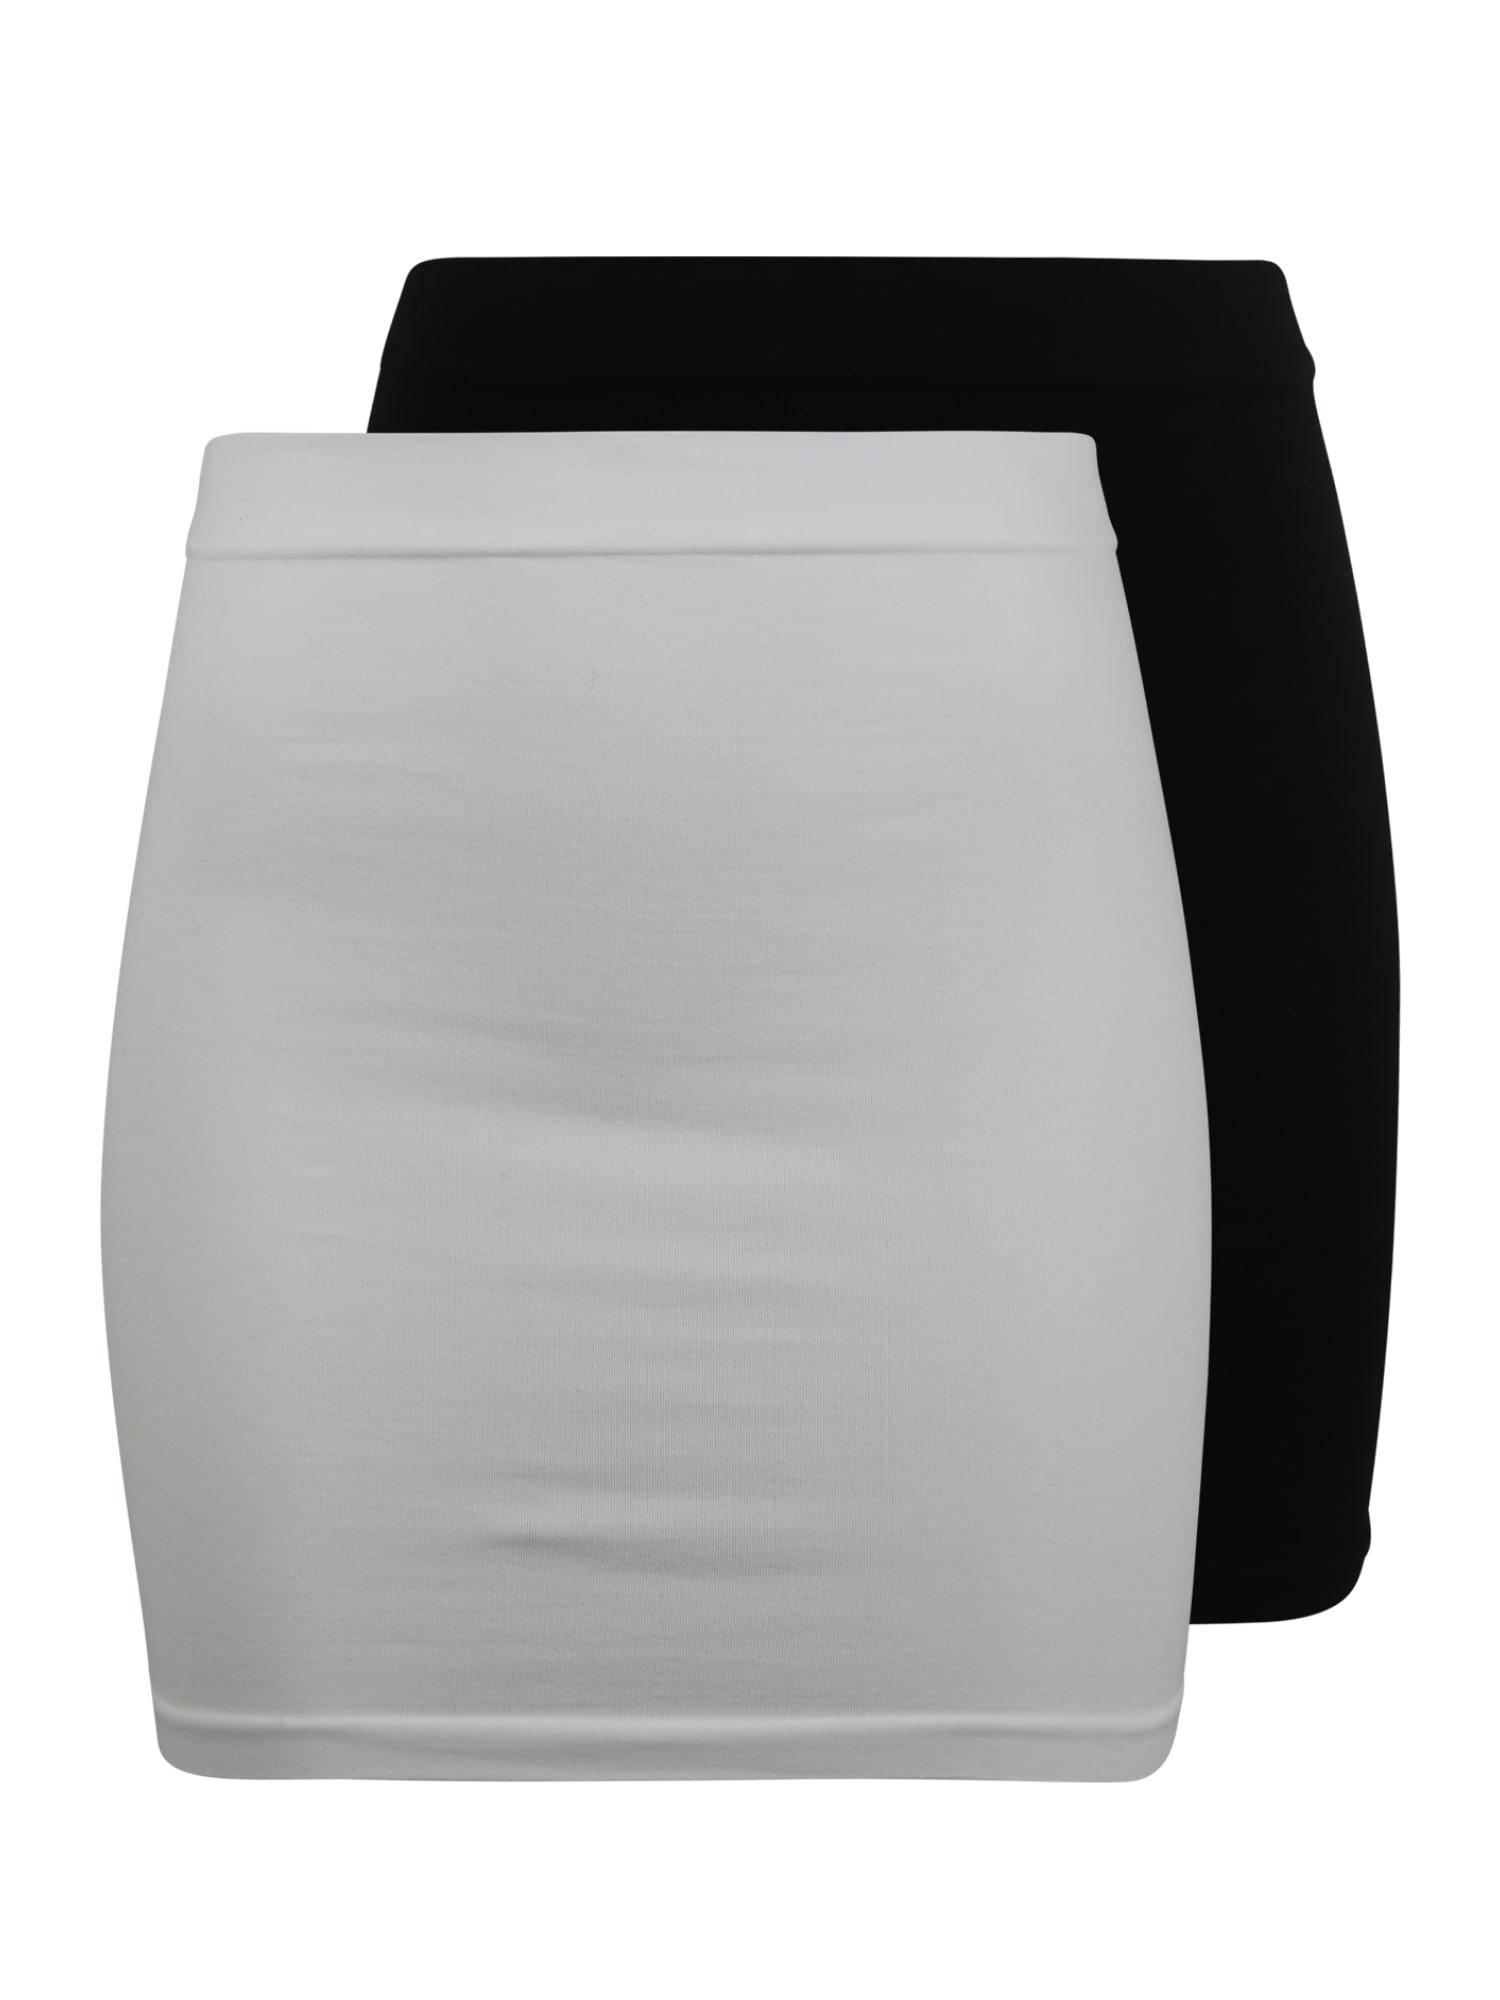 Bauchband 'MLCARA COTTON BUMPBAND 2-PACK O.' | Bekleidung > Umstandsmode > Bauchbänder | Schwarz - Weiß | Mamalicious